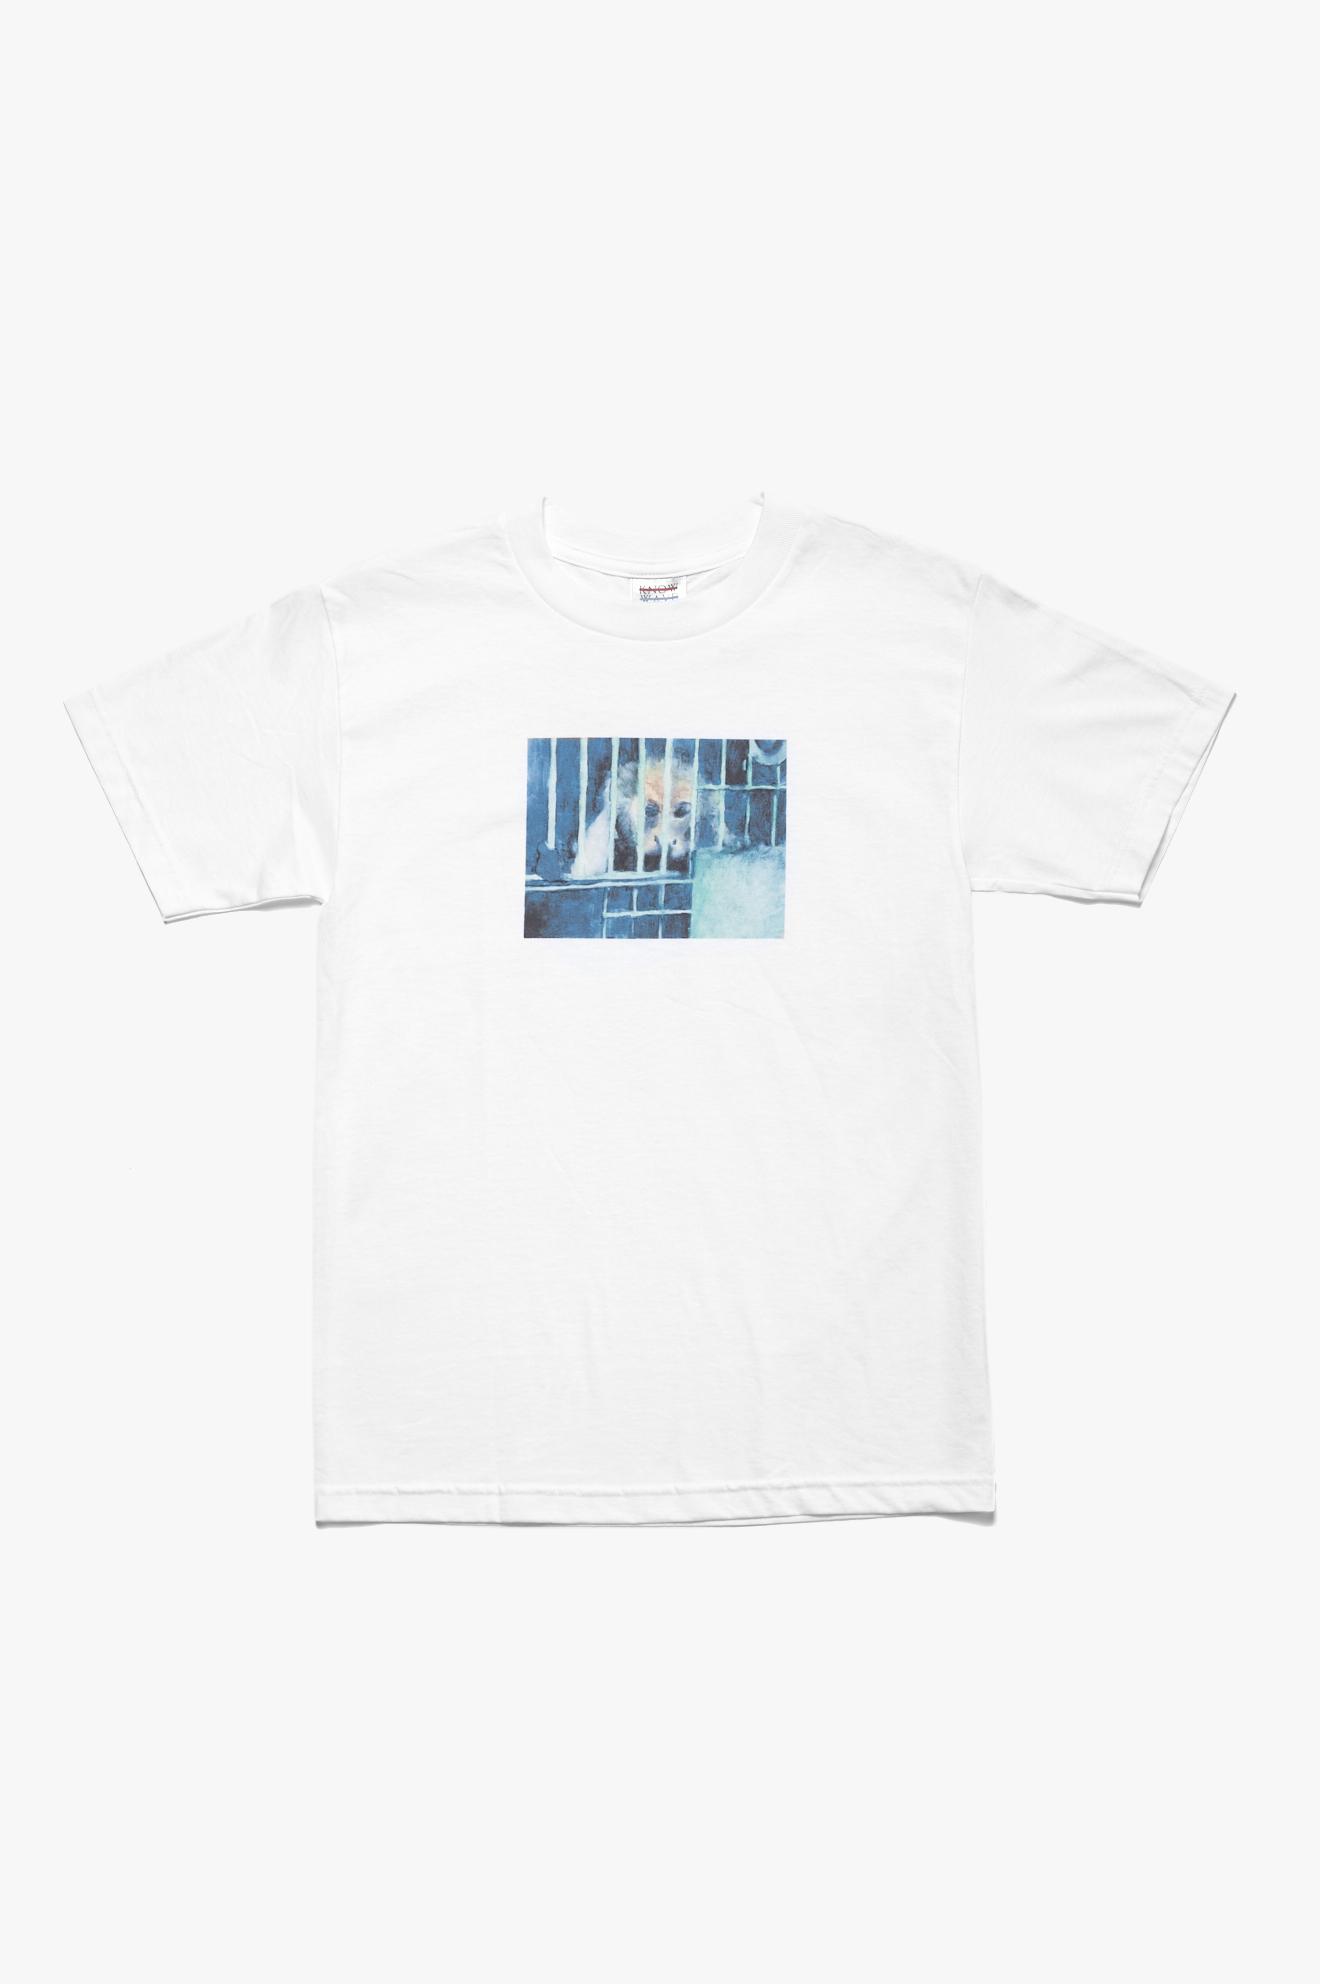 Lucien Smith T-Shirt White